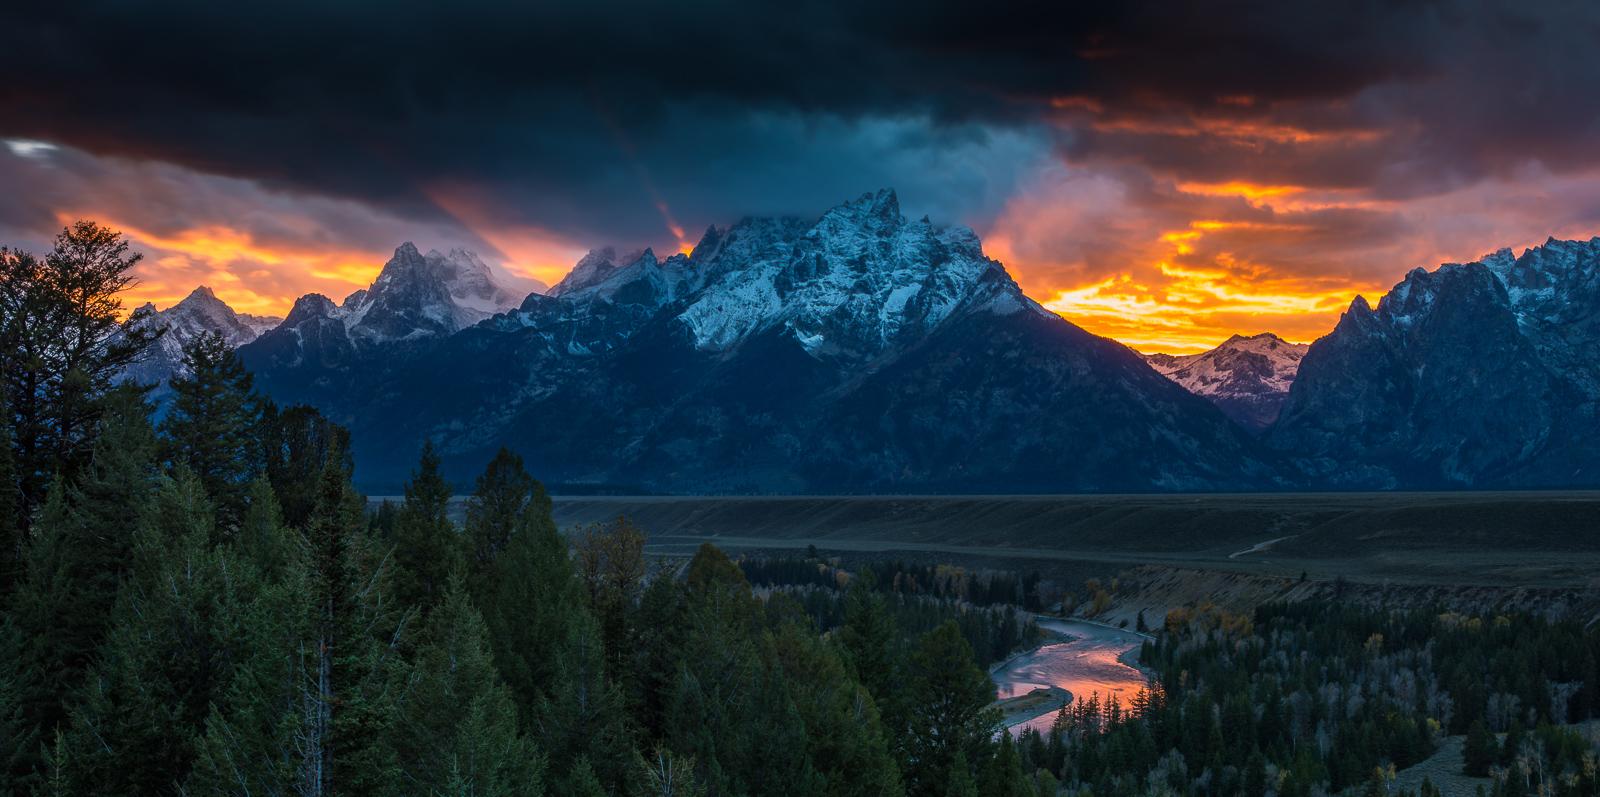 Snake River on Fire, Grand Teton National Park, photo